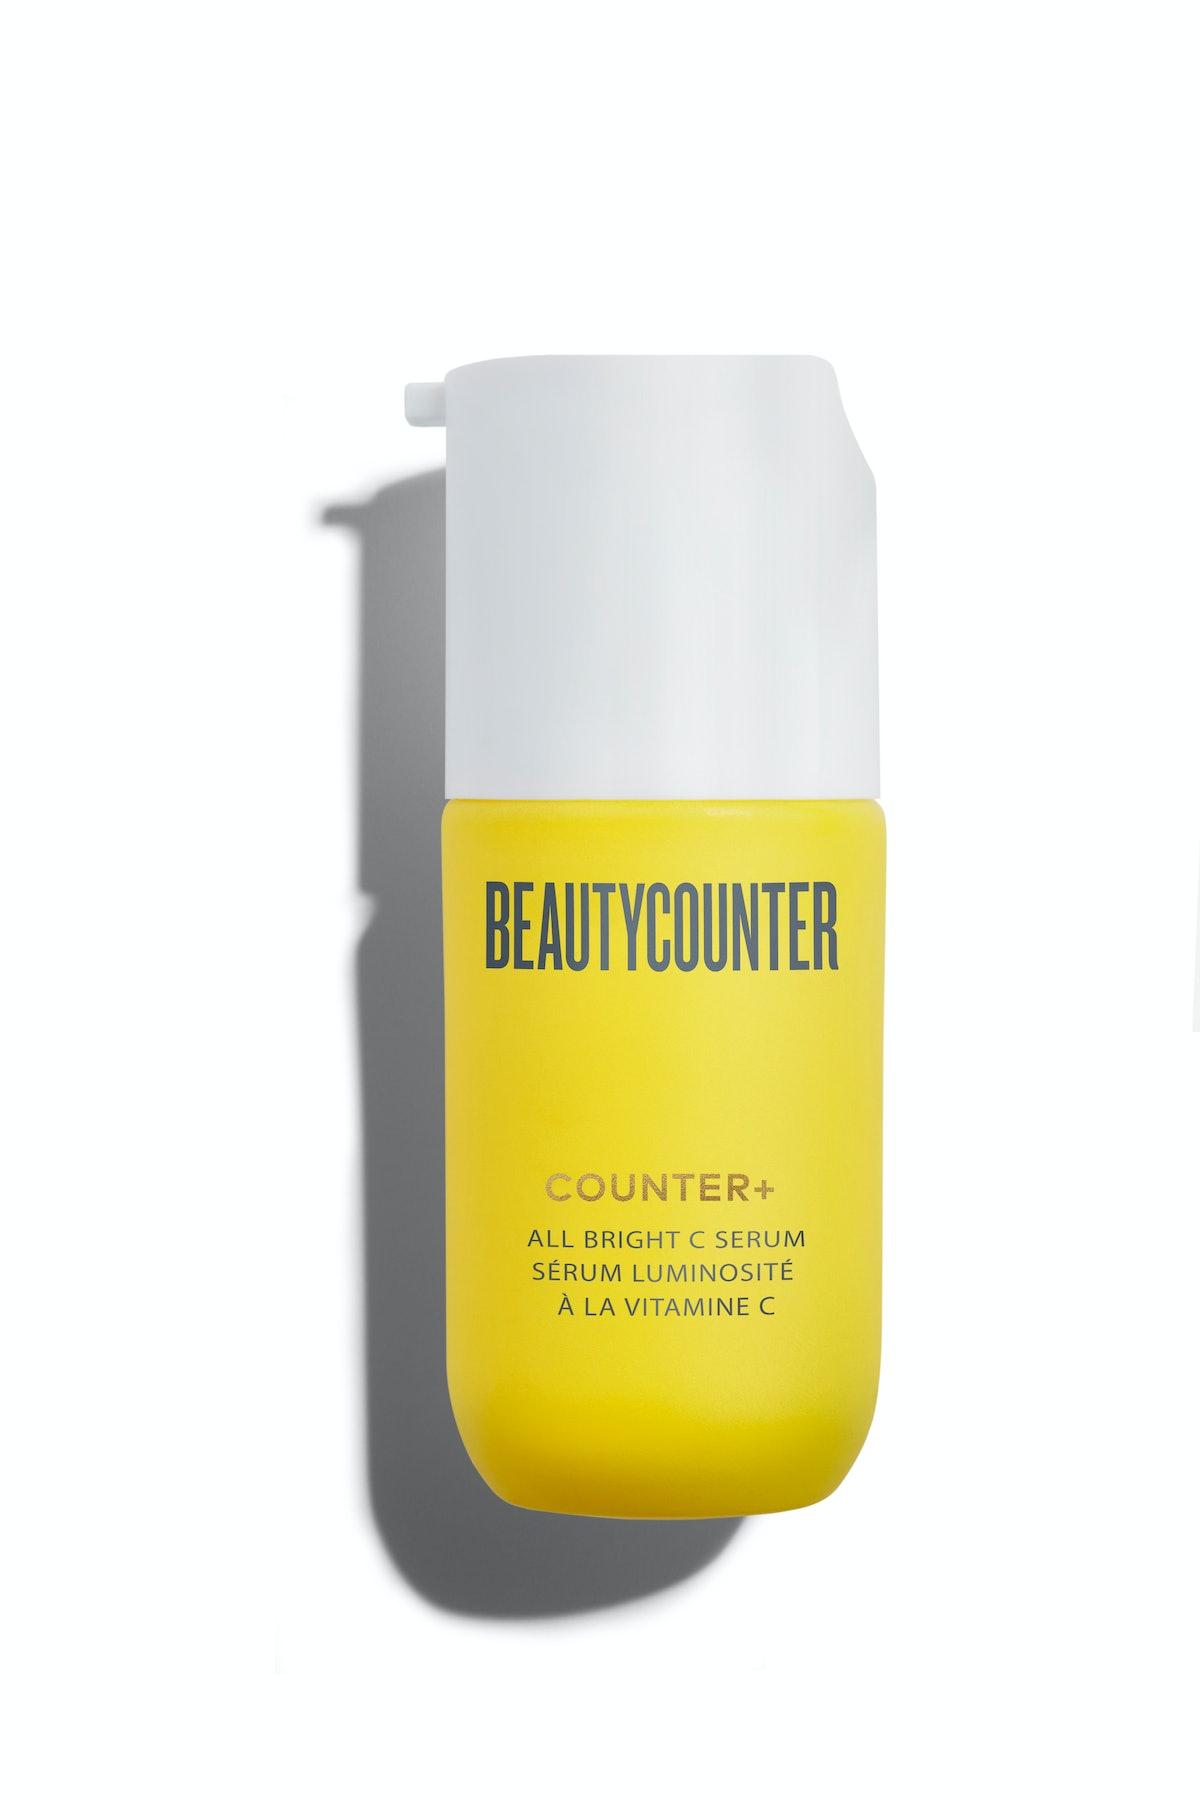 Counter+ All Bright C Serum